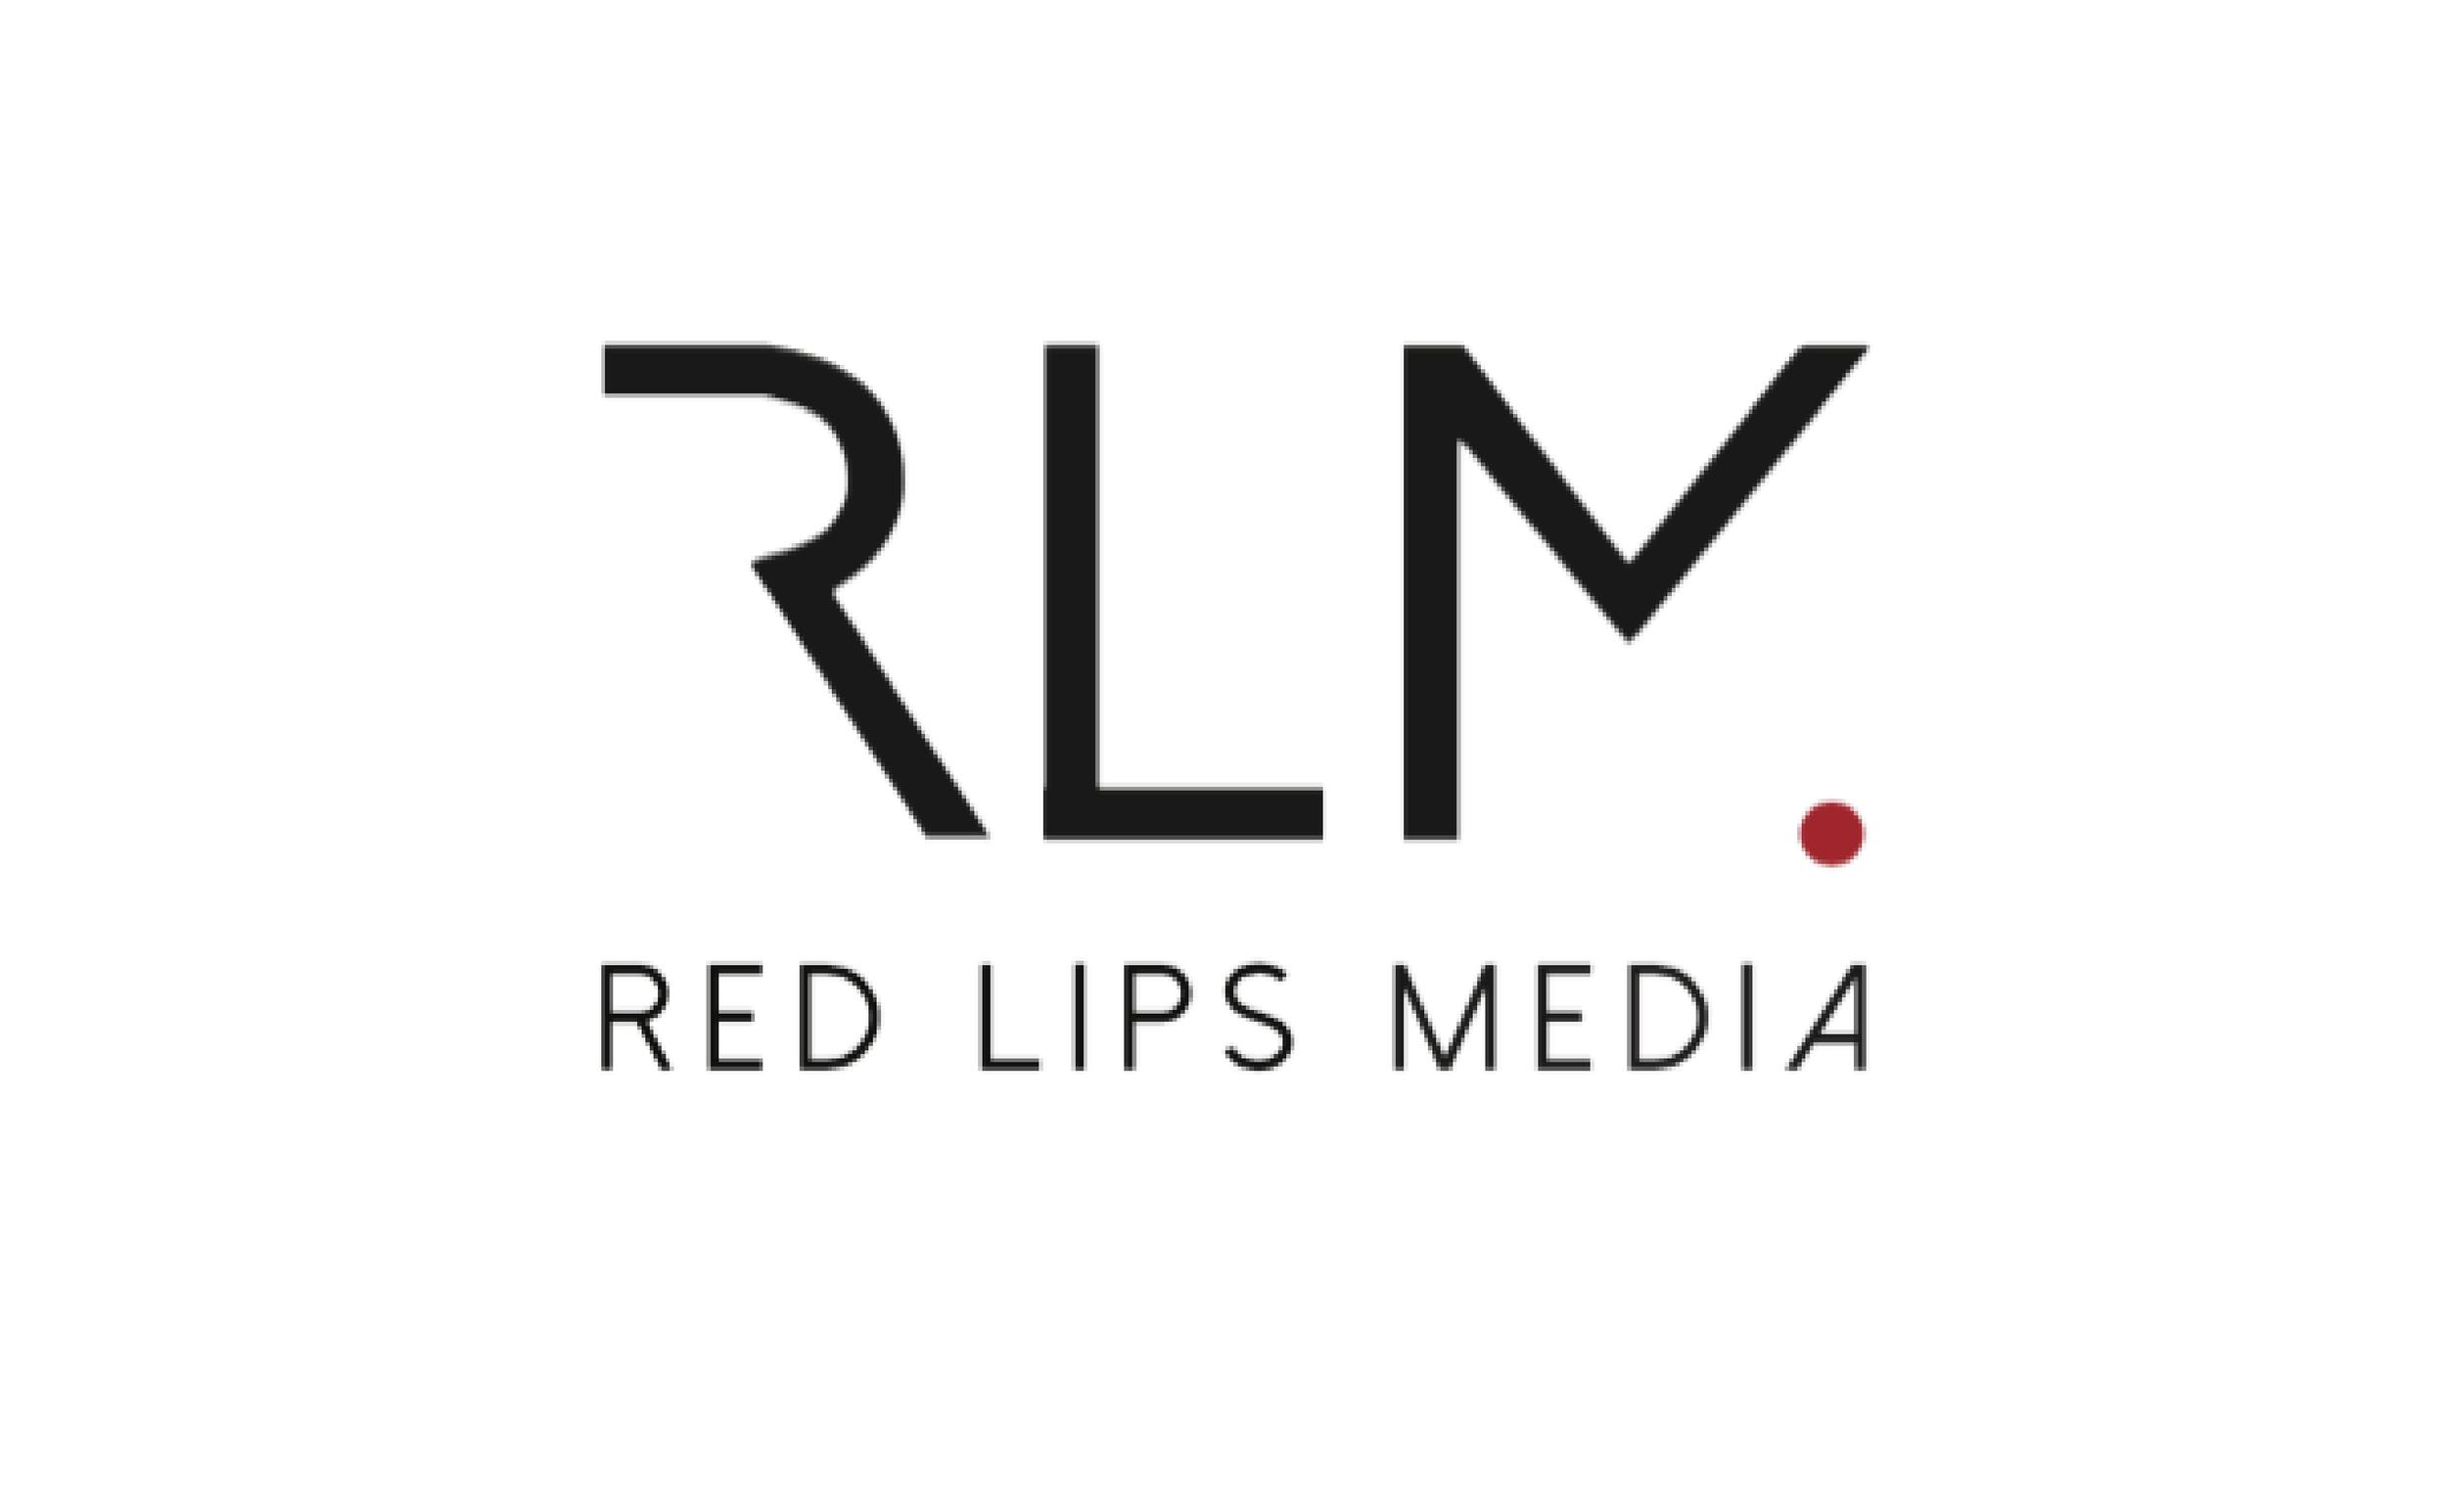 Red Lips Media